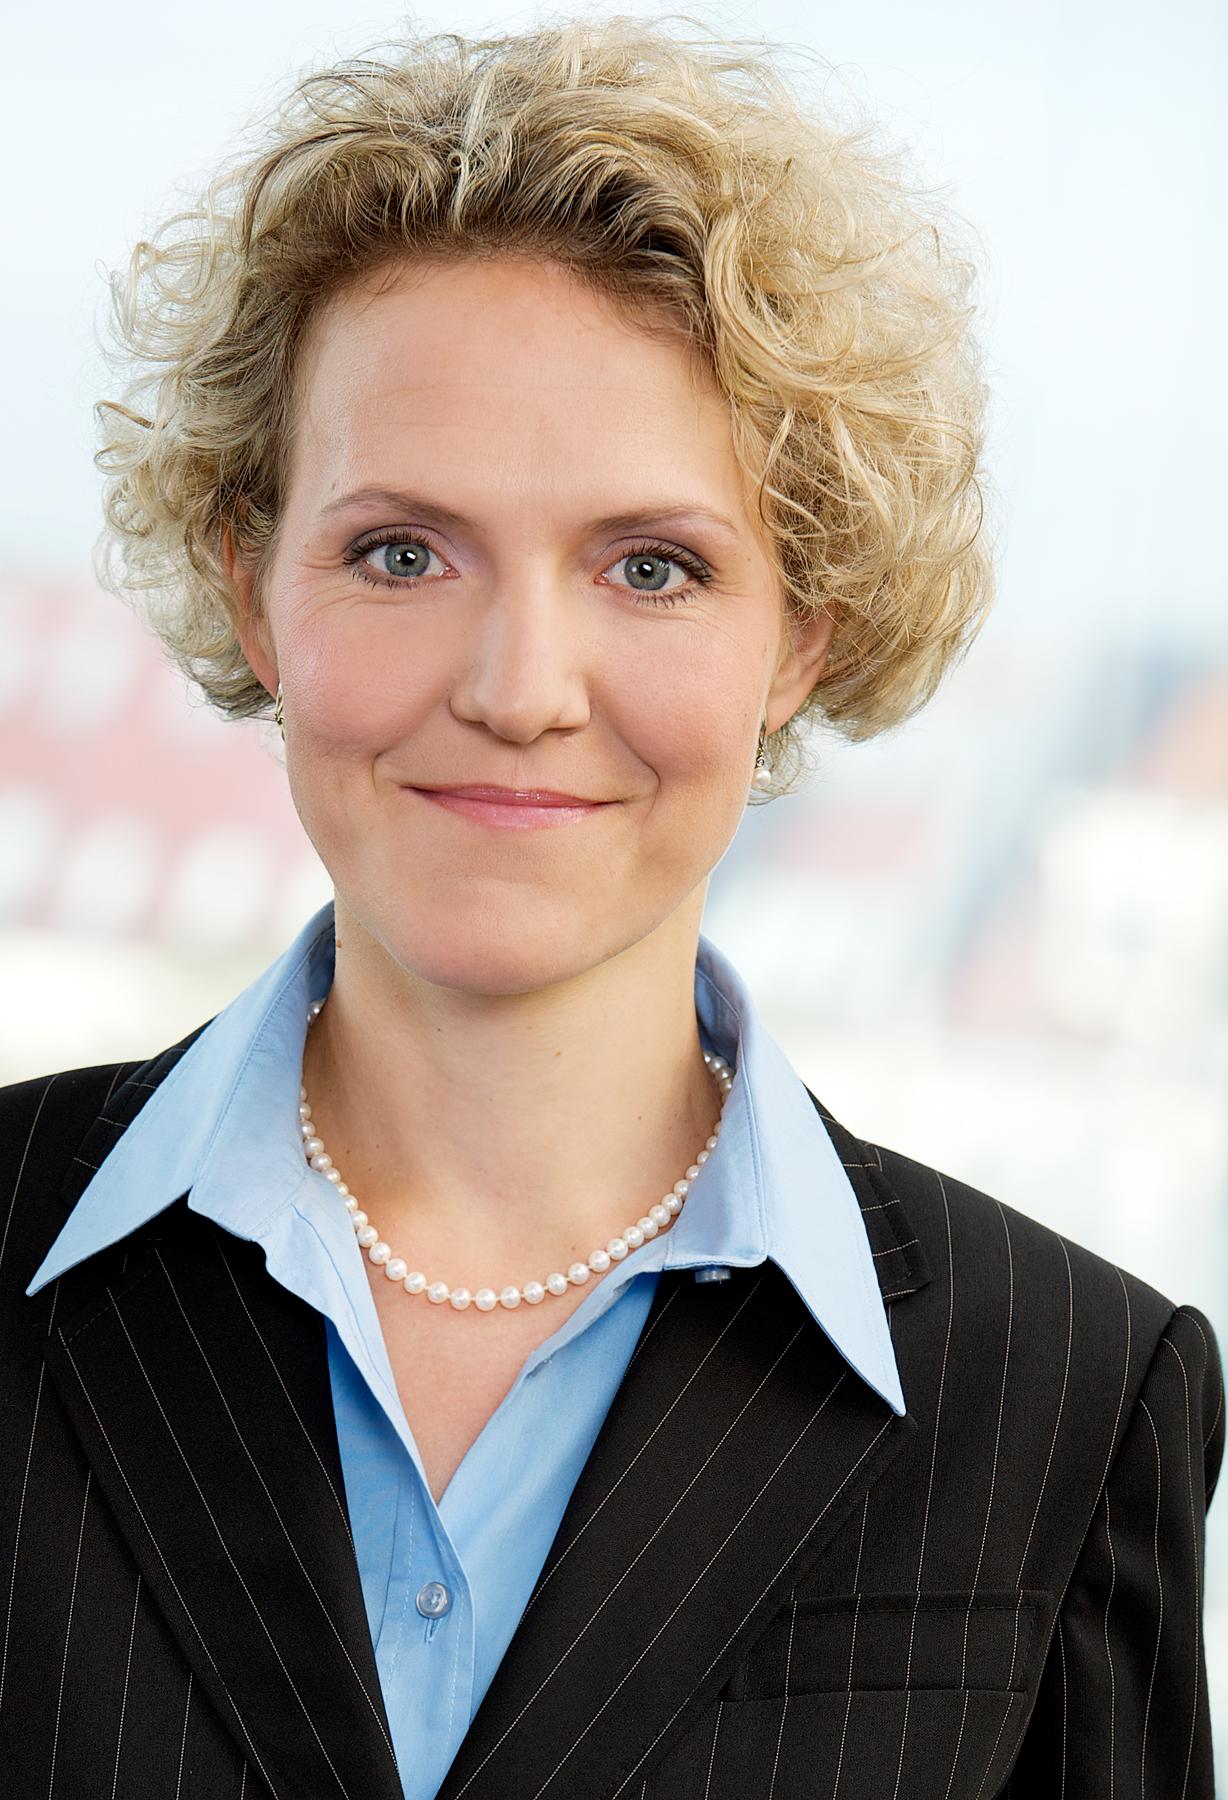 Tanja Galander